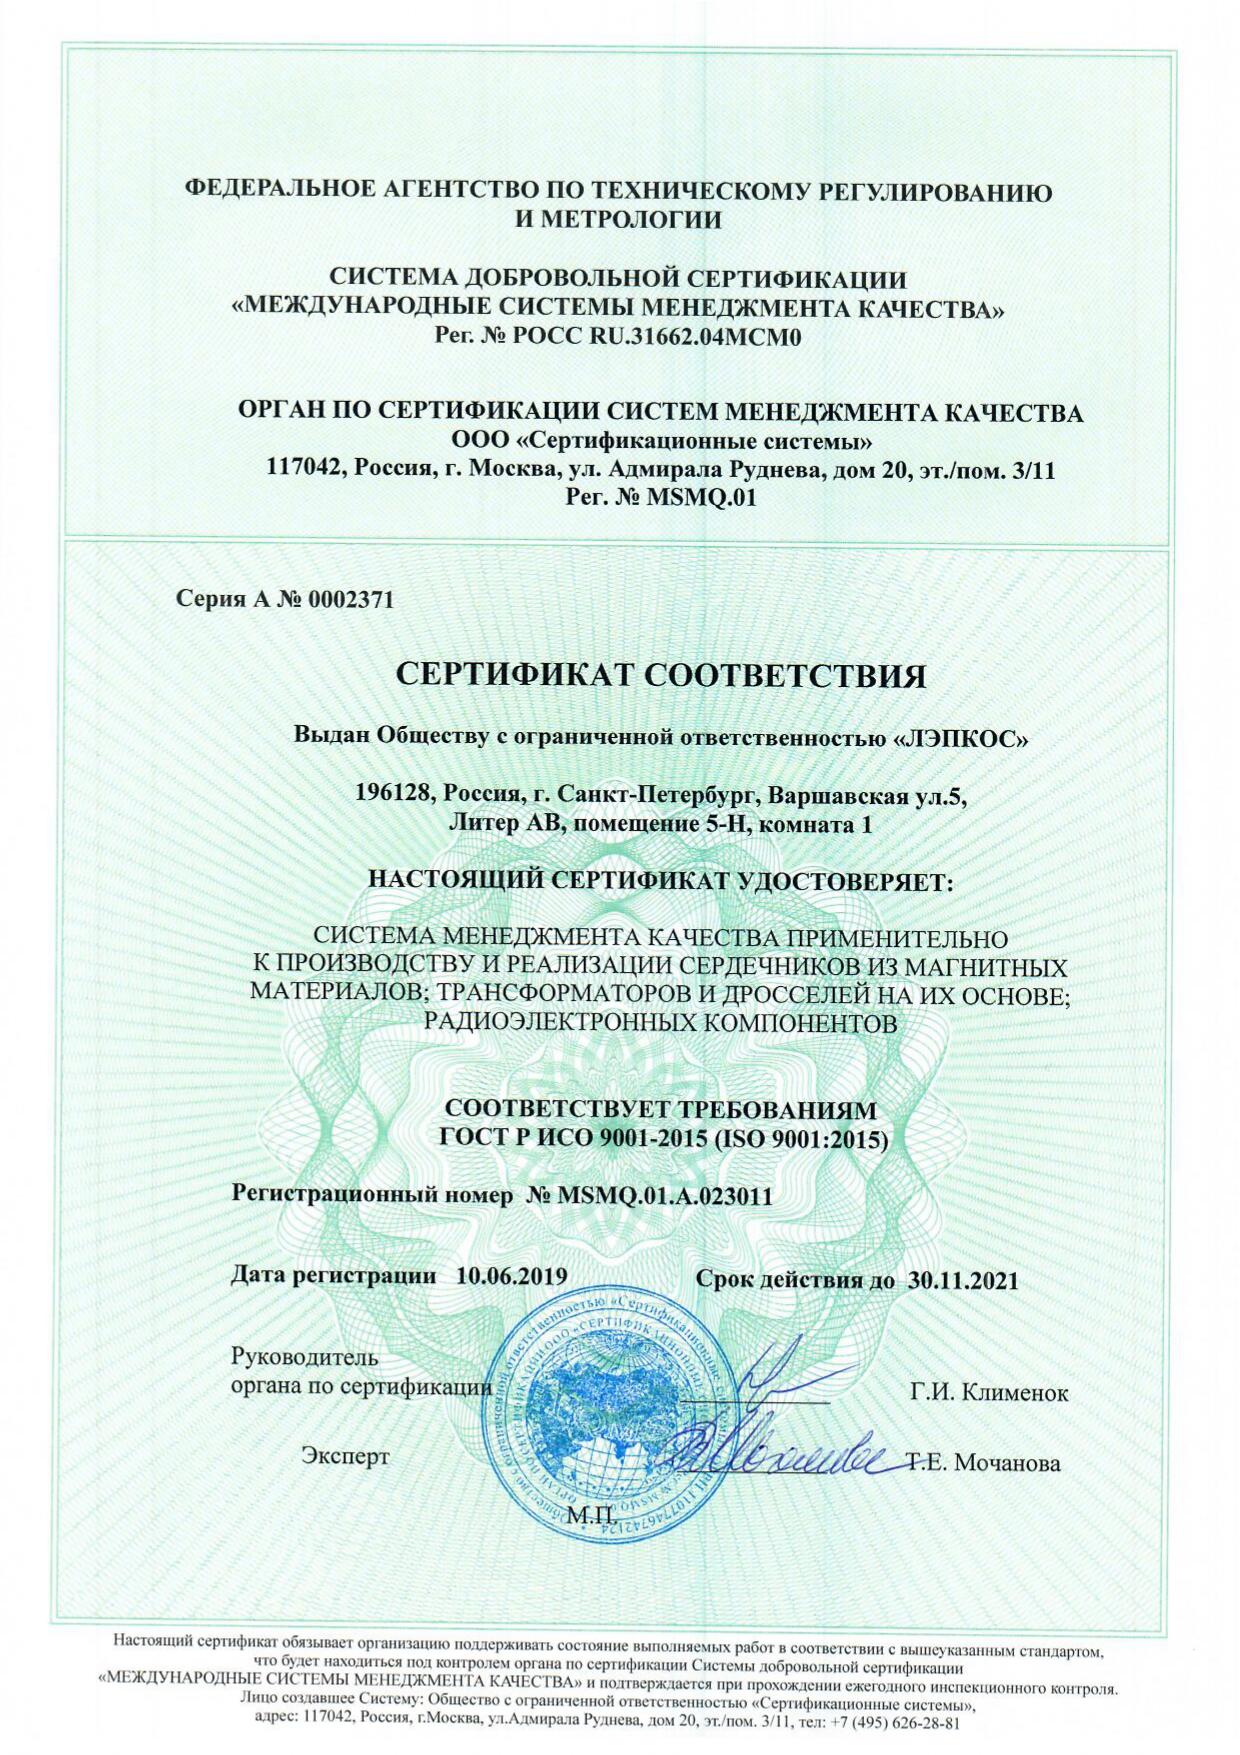 Сертификат соответствия ГОСТ Р ИСО 9001-2015 (ISO 9001:2015). Рег. № MSMQ.01.A.023011